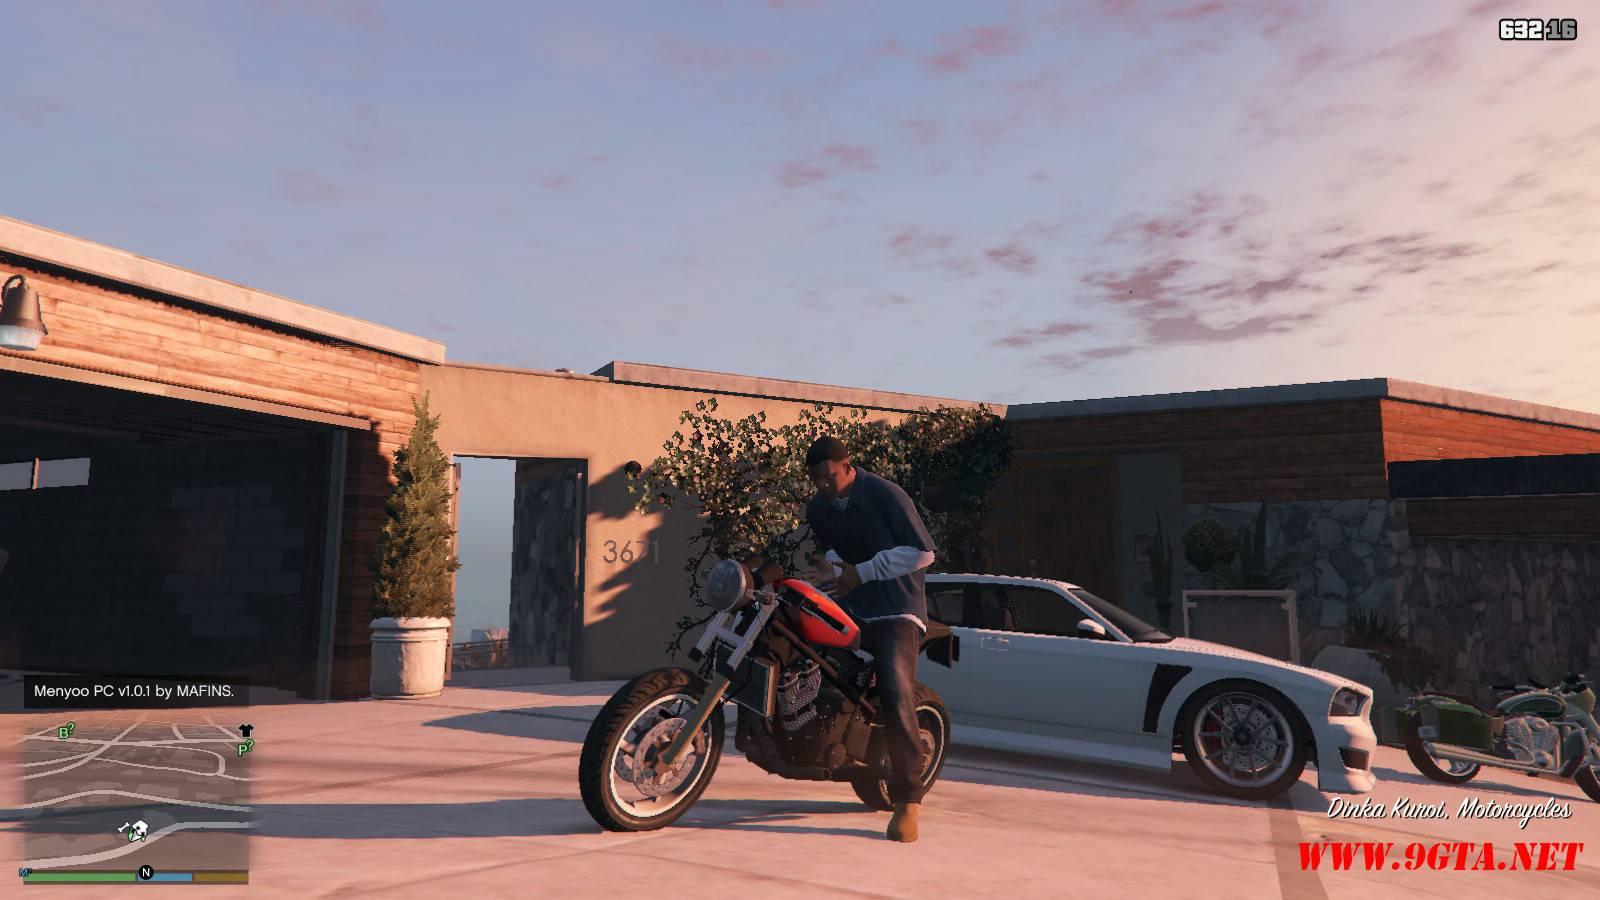 Dinka Kuroi Motorcycle GTA5 Mods (1)